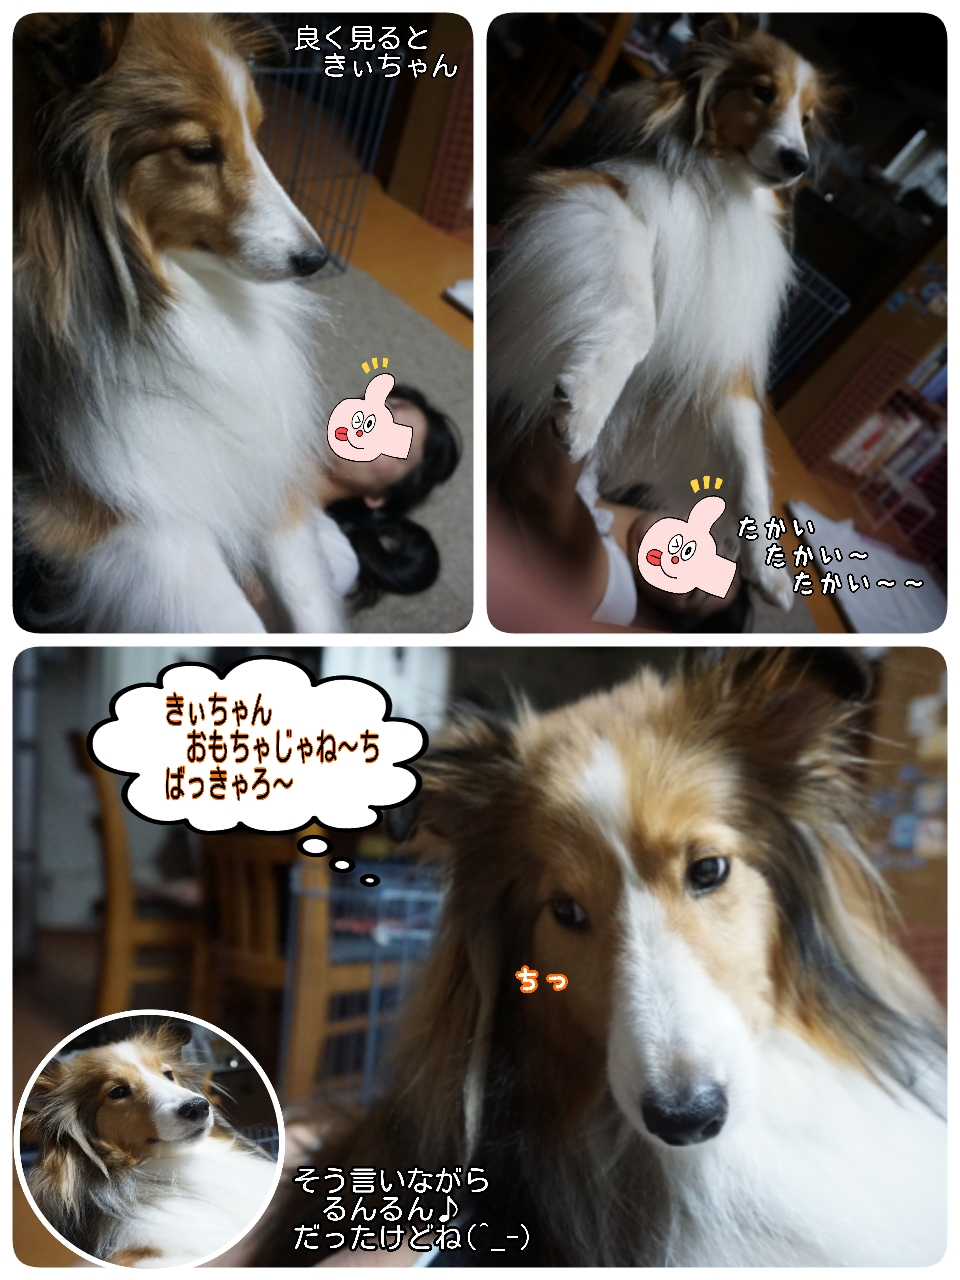 16-09-12-09-43-16-879_deco.jpg